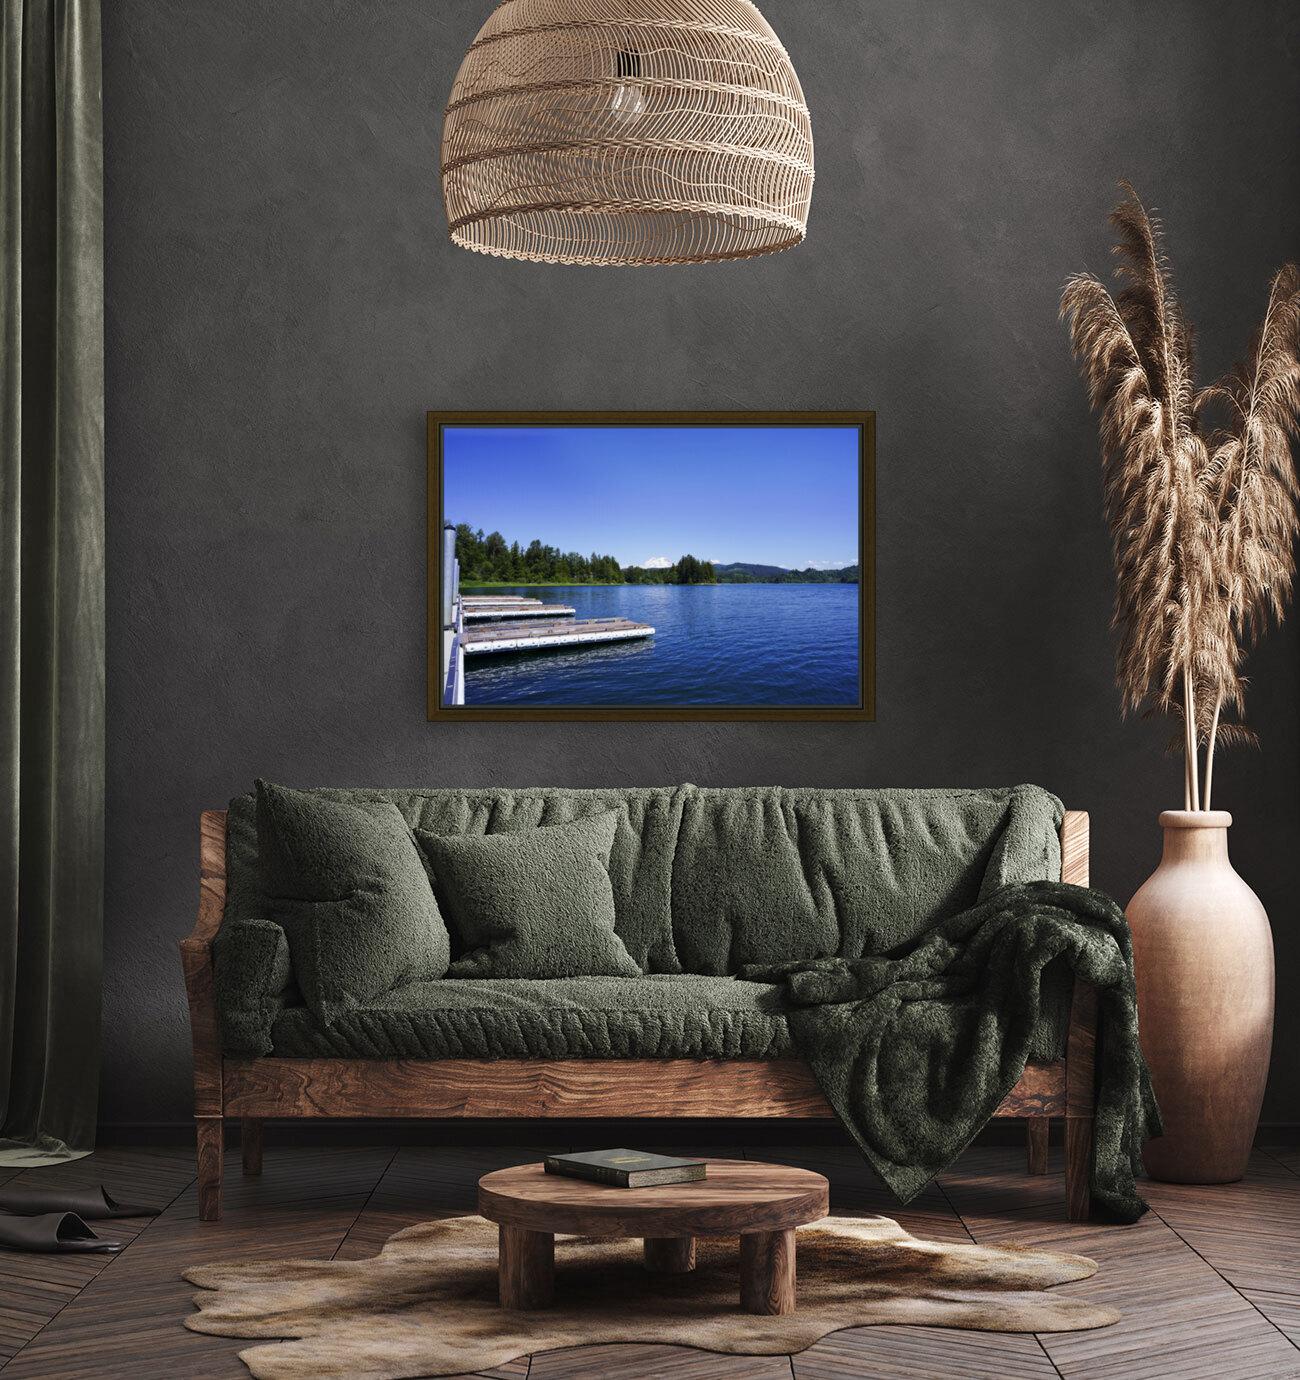 Alder Lake and Mount Rainier Pacific Northwest United States  Art